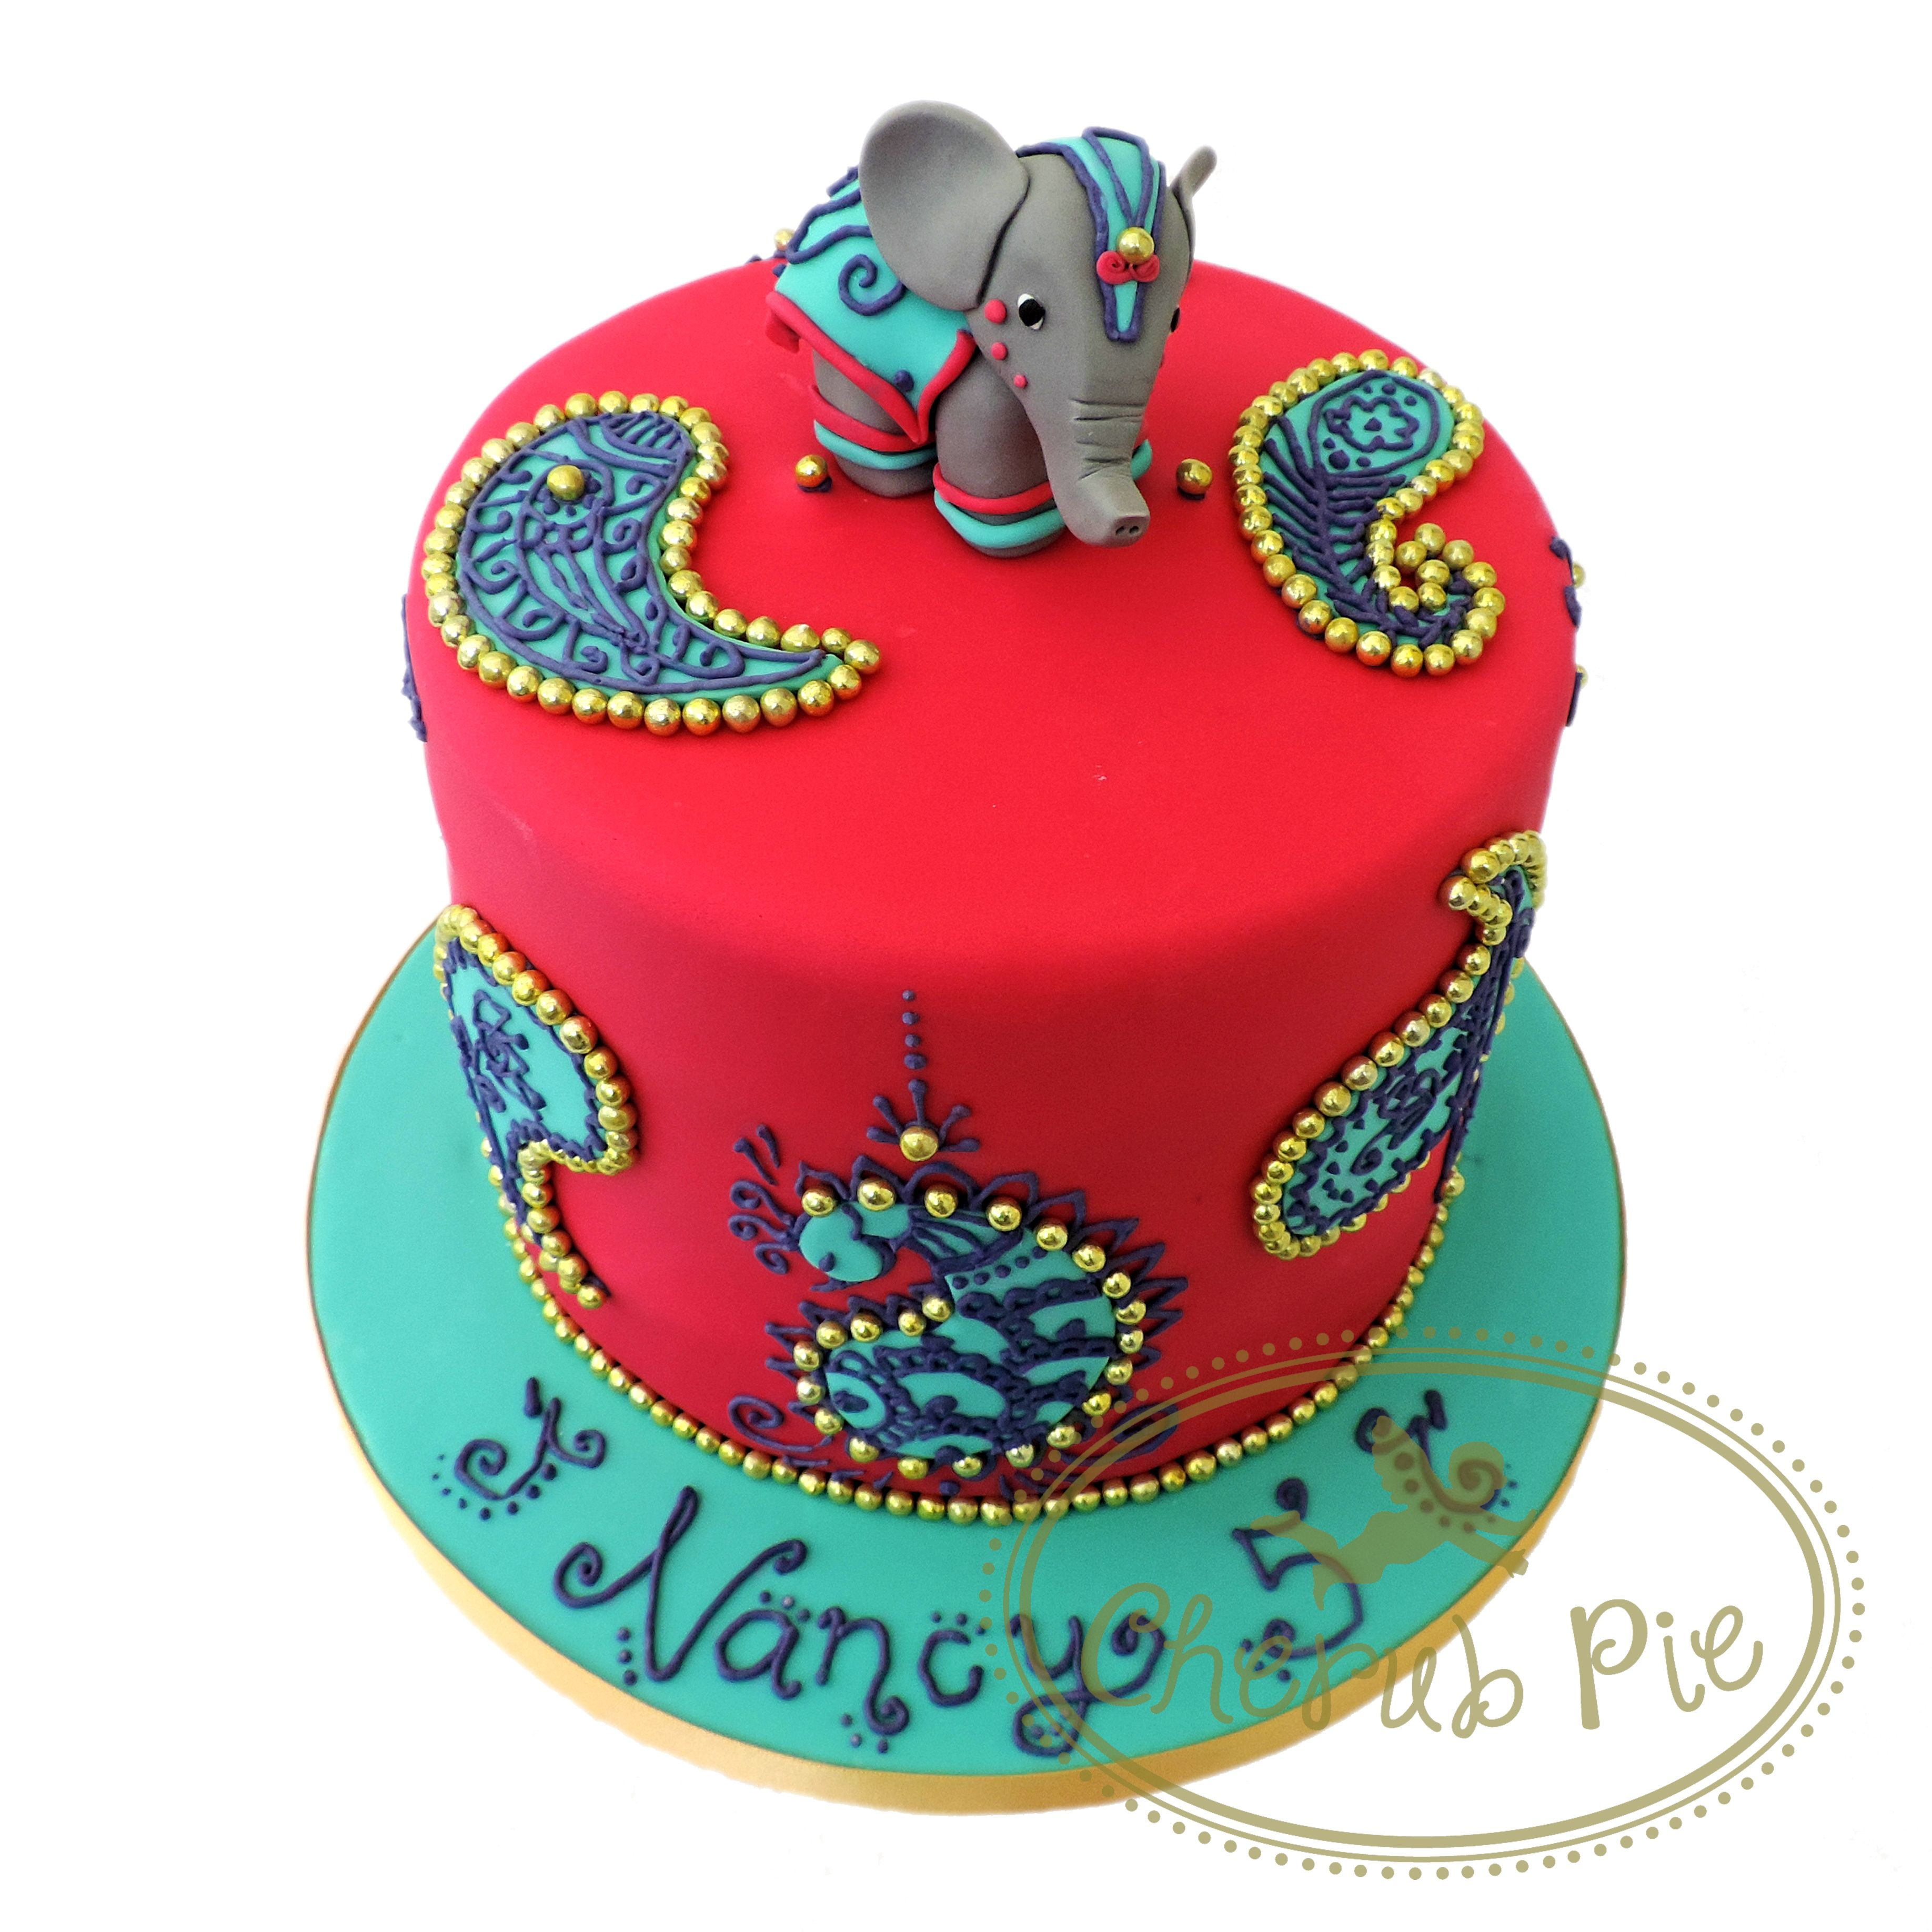 Astonishing Bollywood Elephant Cake Cherub Pie Elephant Birthday Cakes Funny Birthday Cards Online Elaedamsfinfo